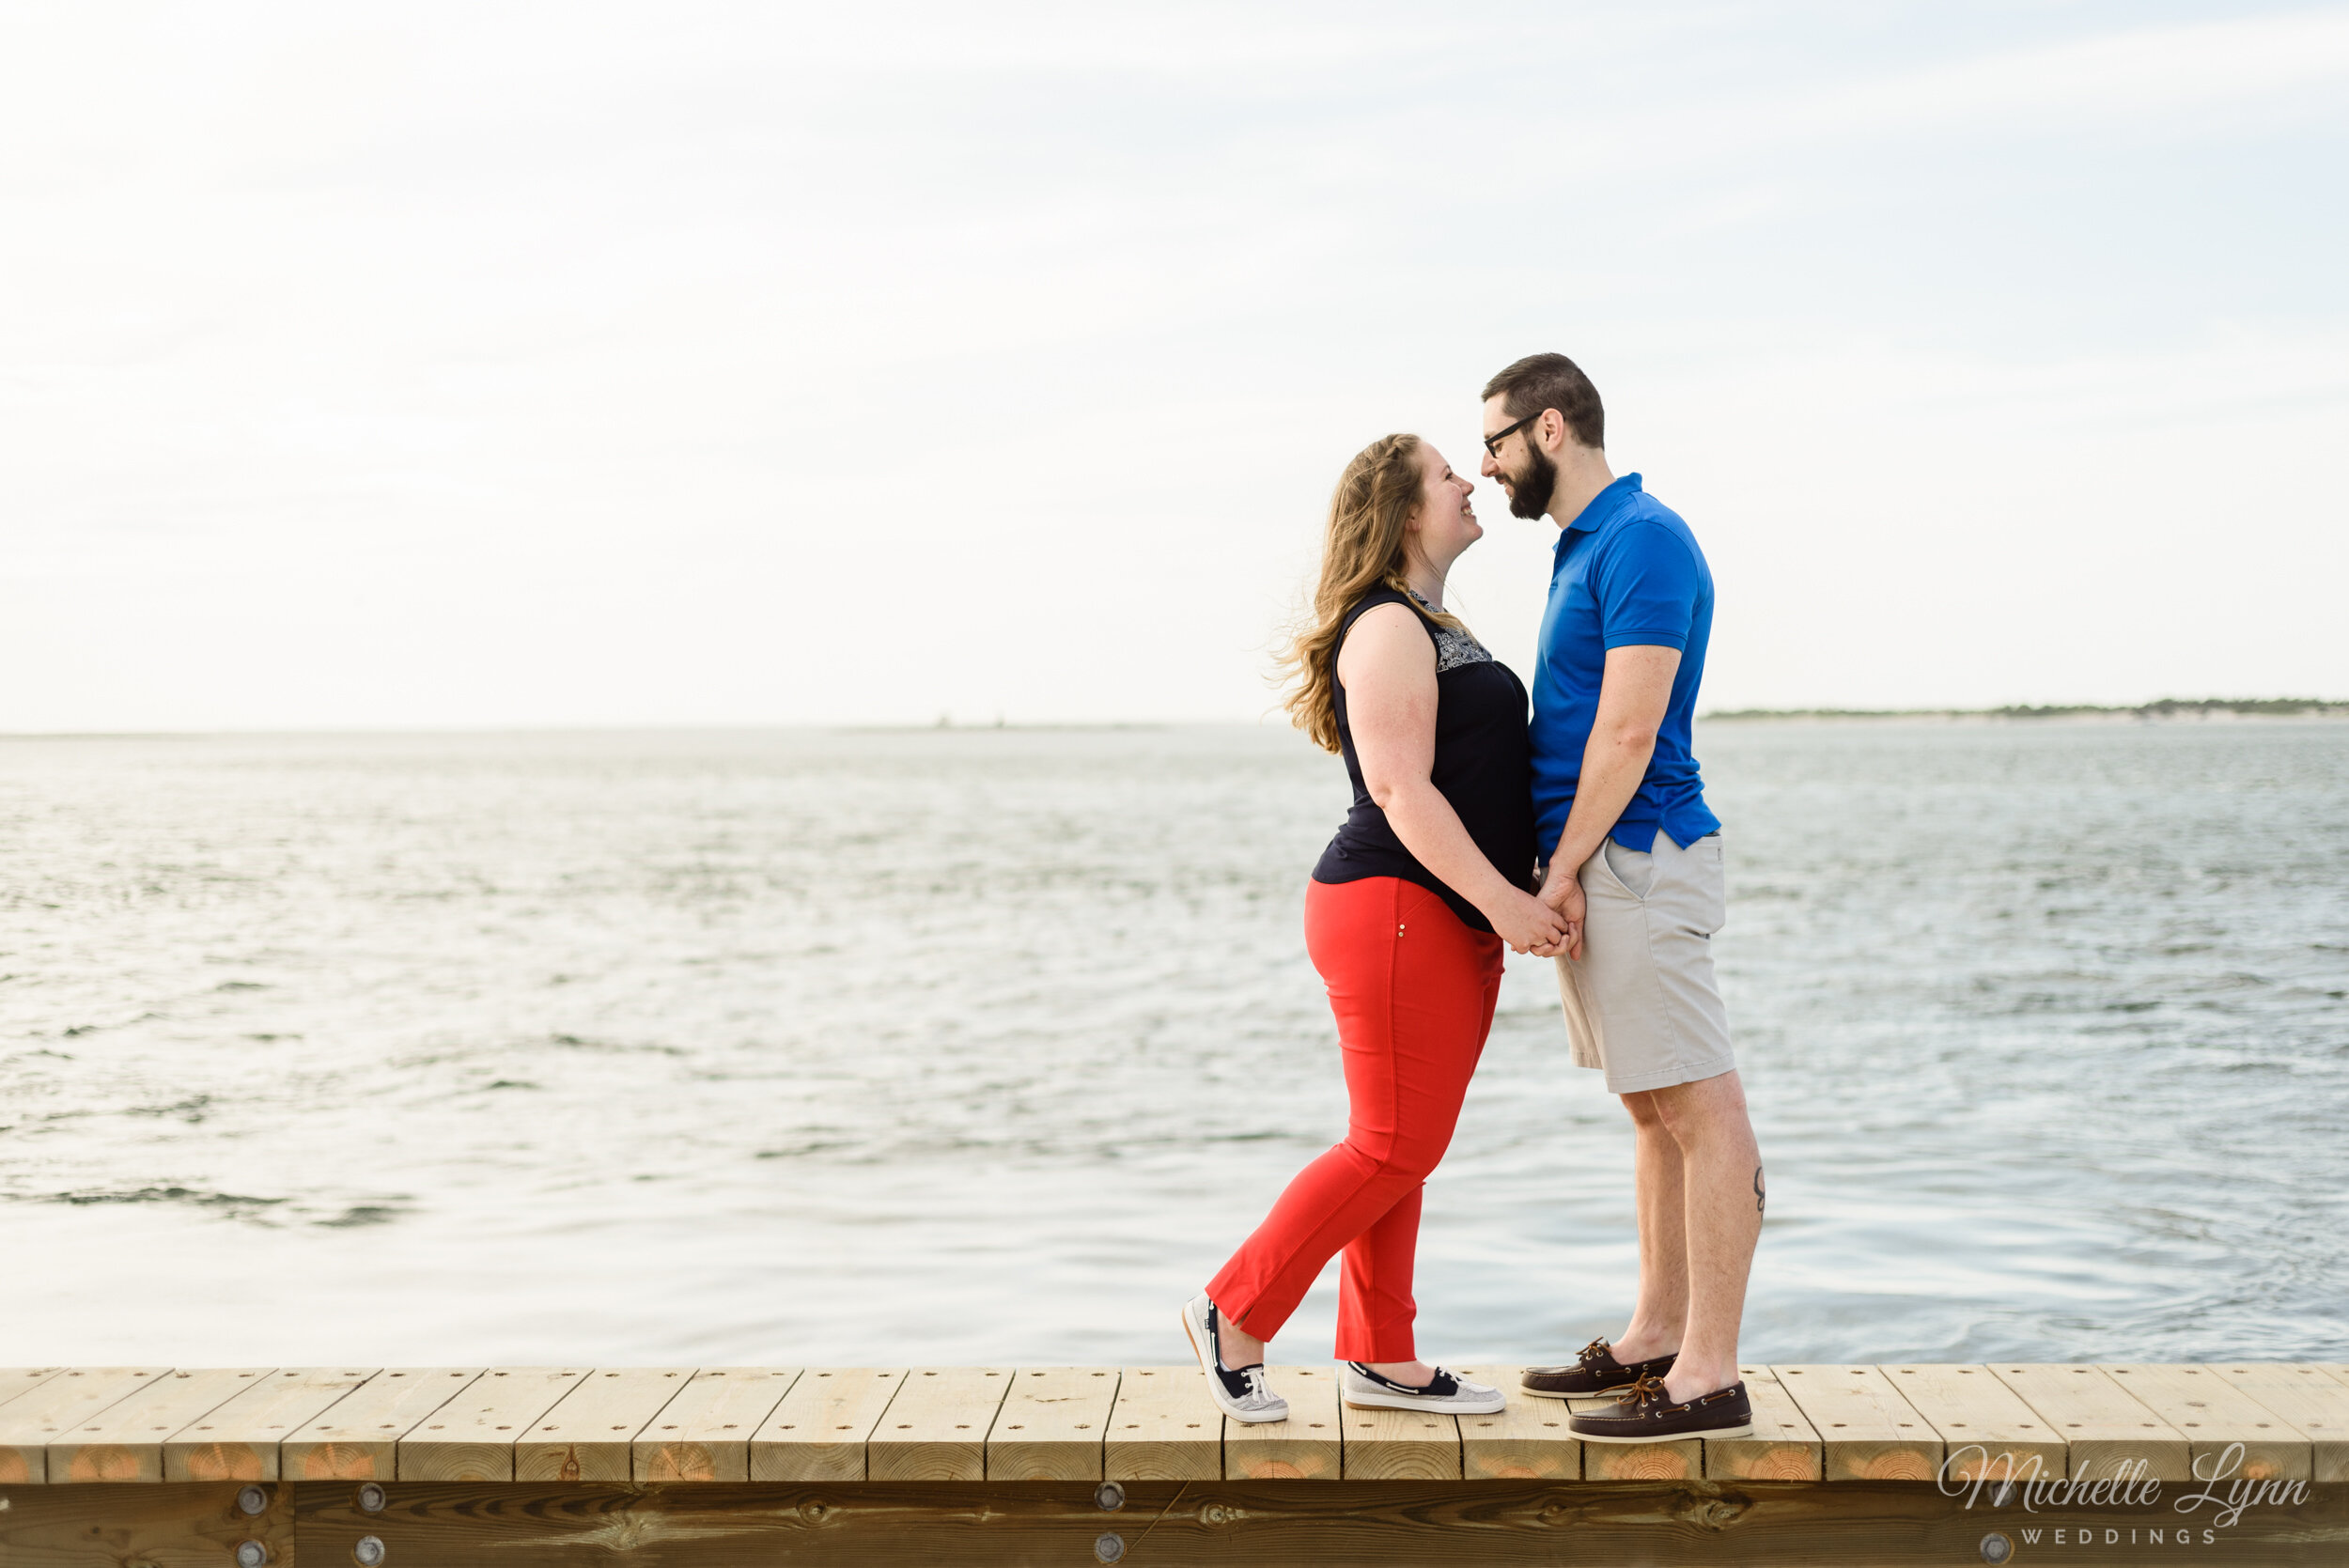 barnegat-lighthouse-engagement-photos-michelle-lynn-weddings-4.jpg